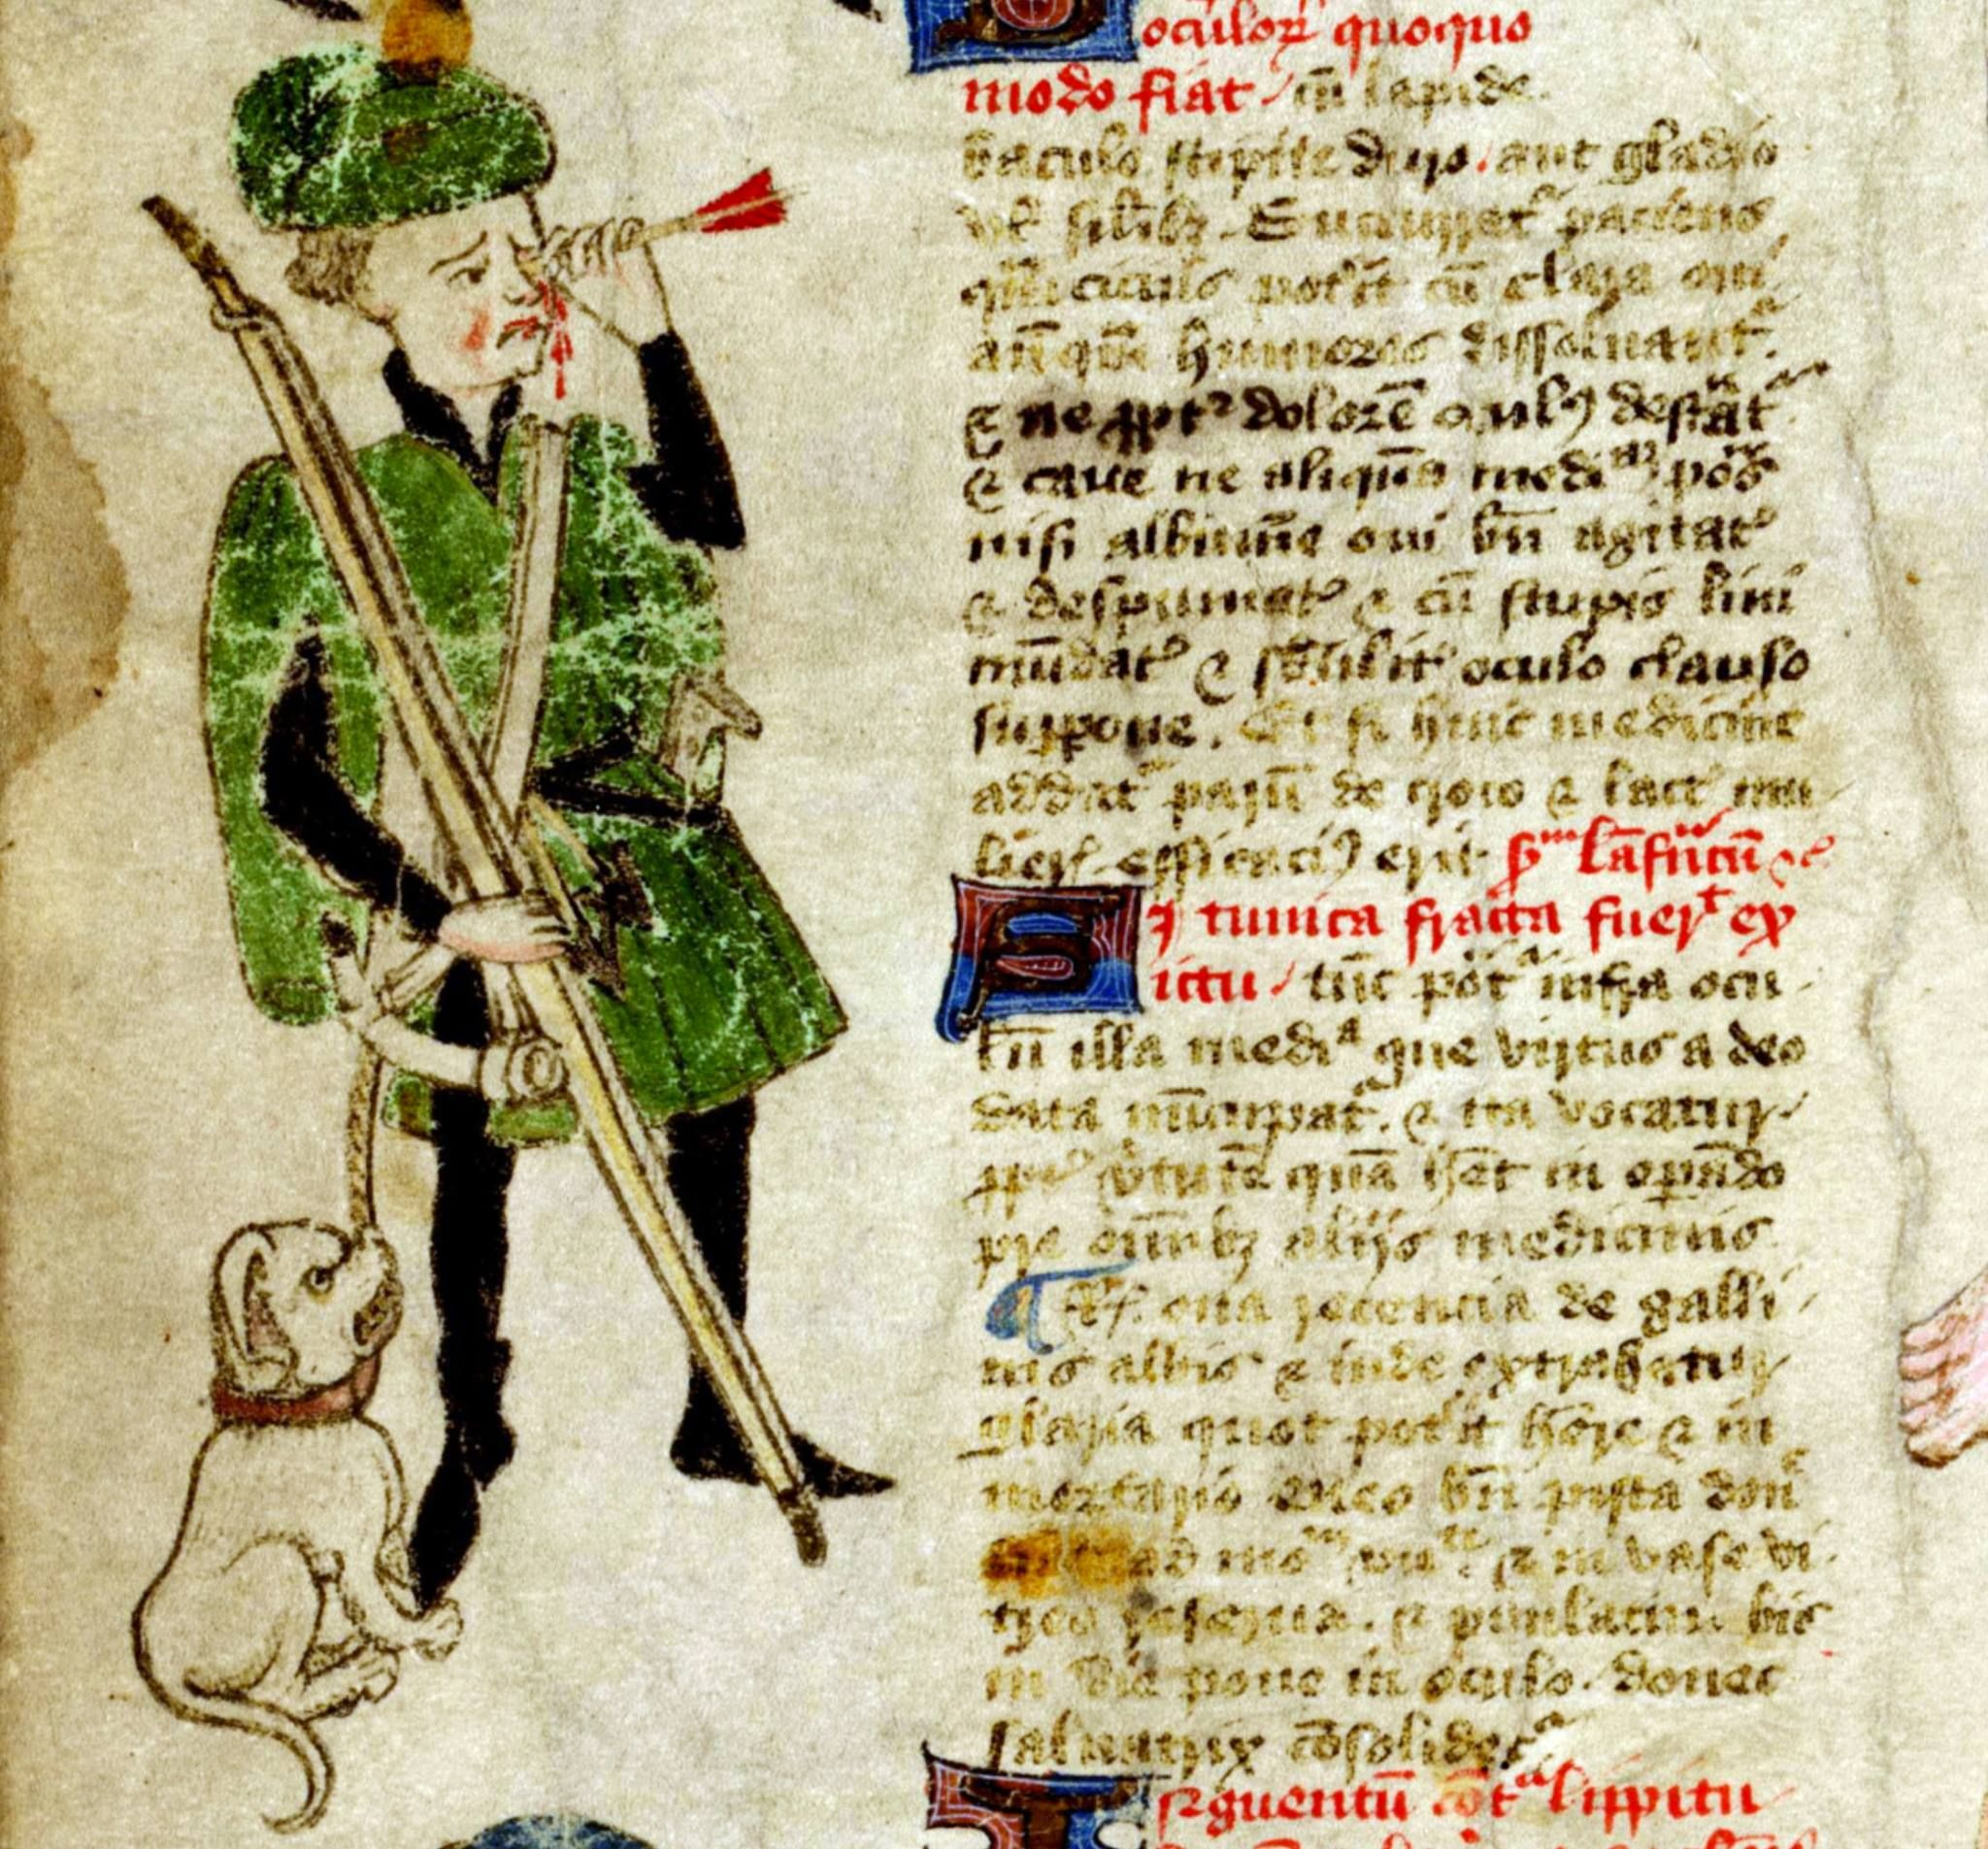 hunting accident  John Arderne, De arte phisicali et de cirurgia, England ca. 1425 (Stockholm, Kungliga biblioteket, X 118)